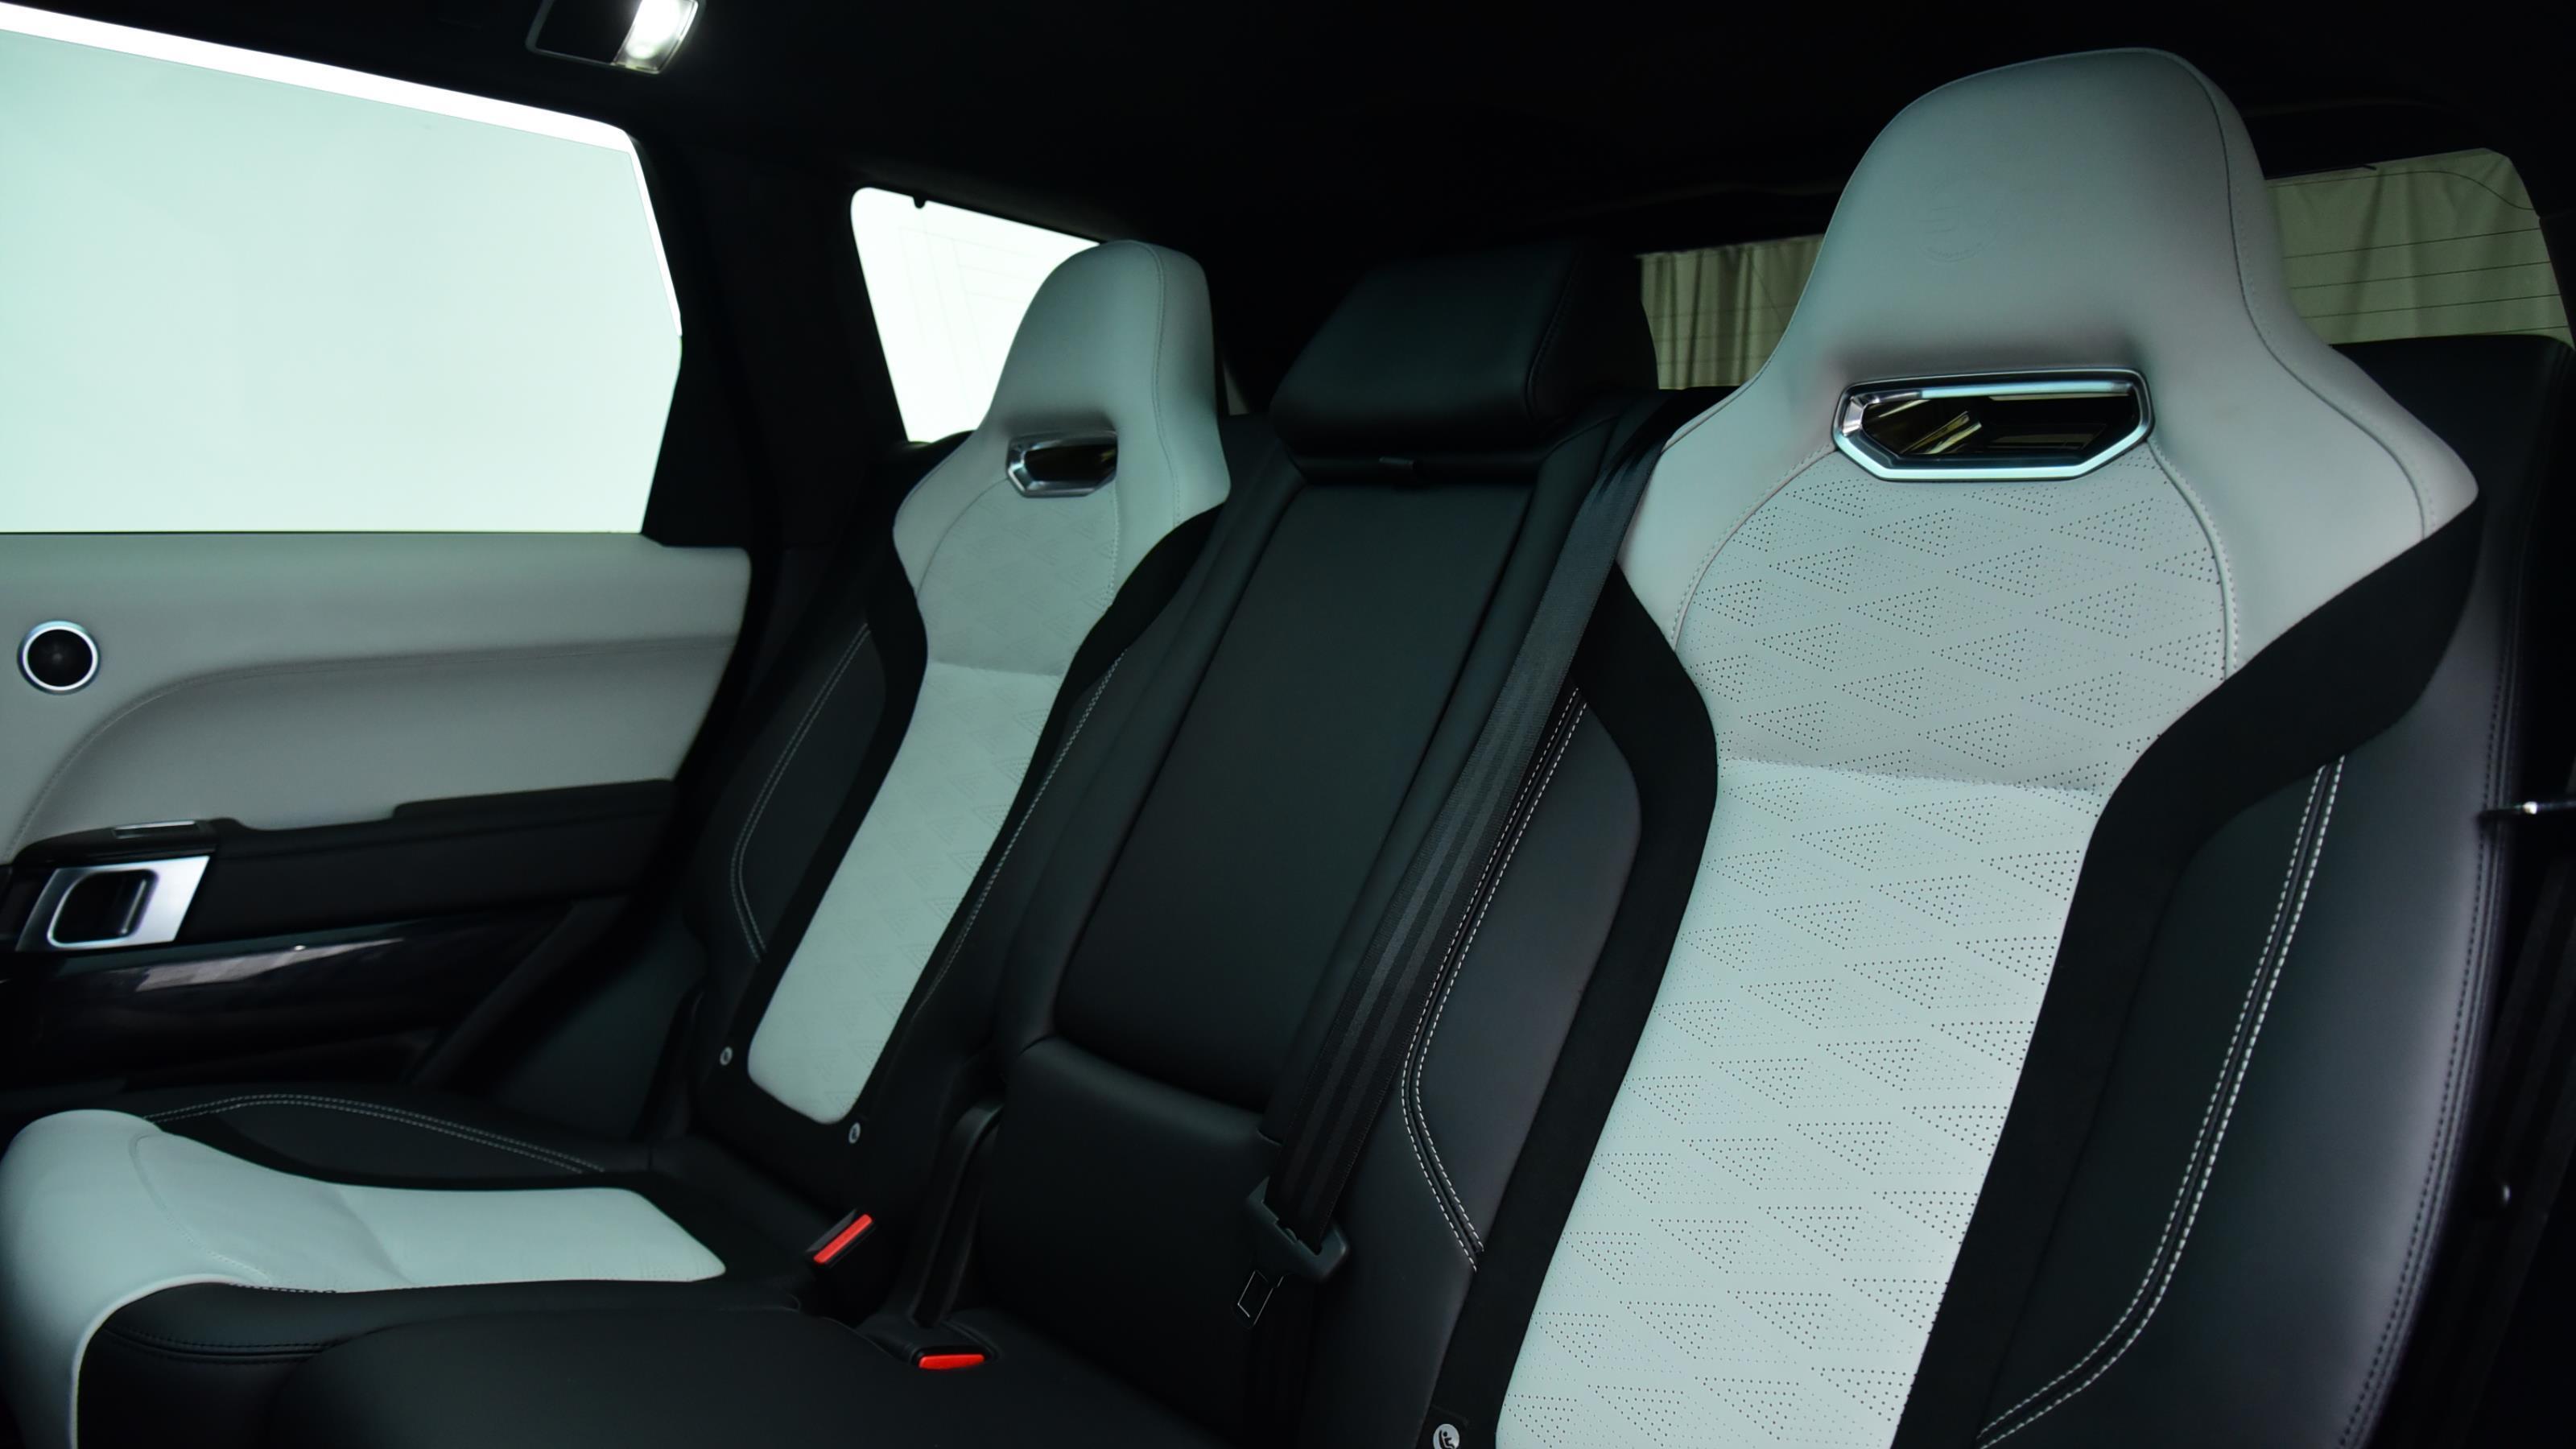 Used 2018 Land Rover RANGE ROVER SPORT 5.0 V8 S/C 575 SVR 5dr Auto Blue at Saxton4x4